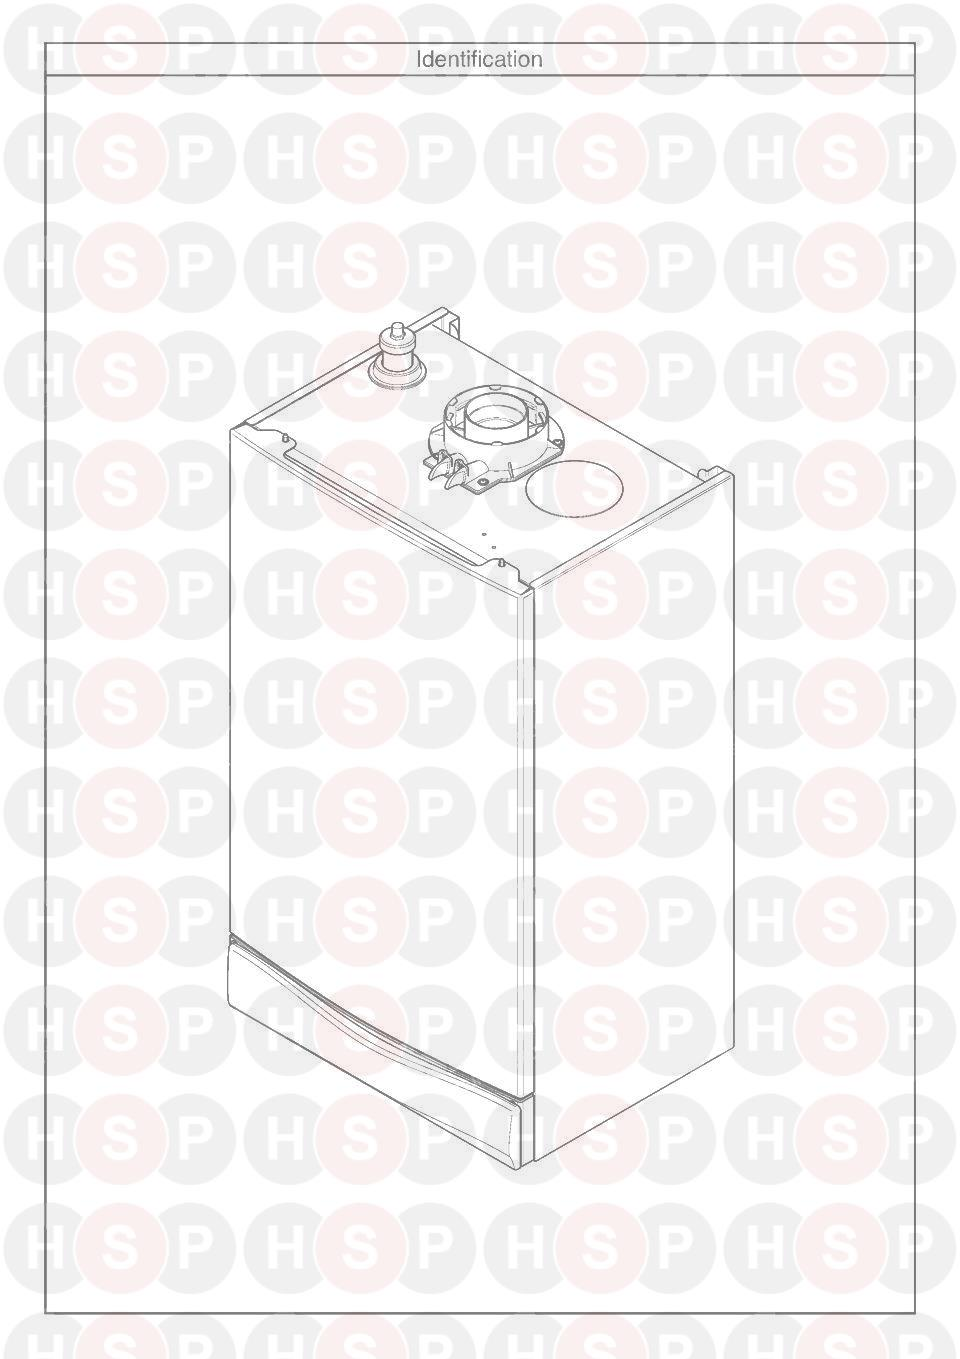 Potterton APOLLO 25 (APPLIANCE IDENTIFICATION)Diagram